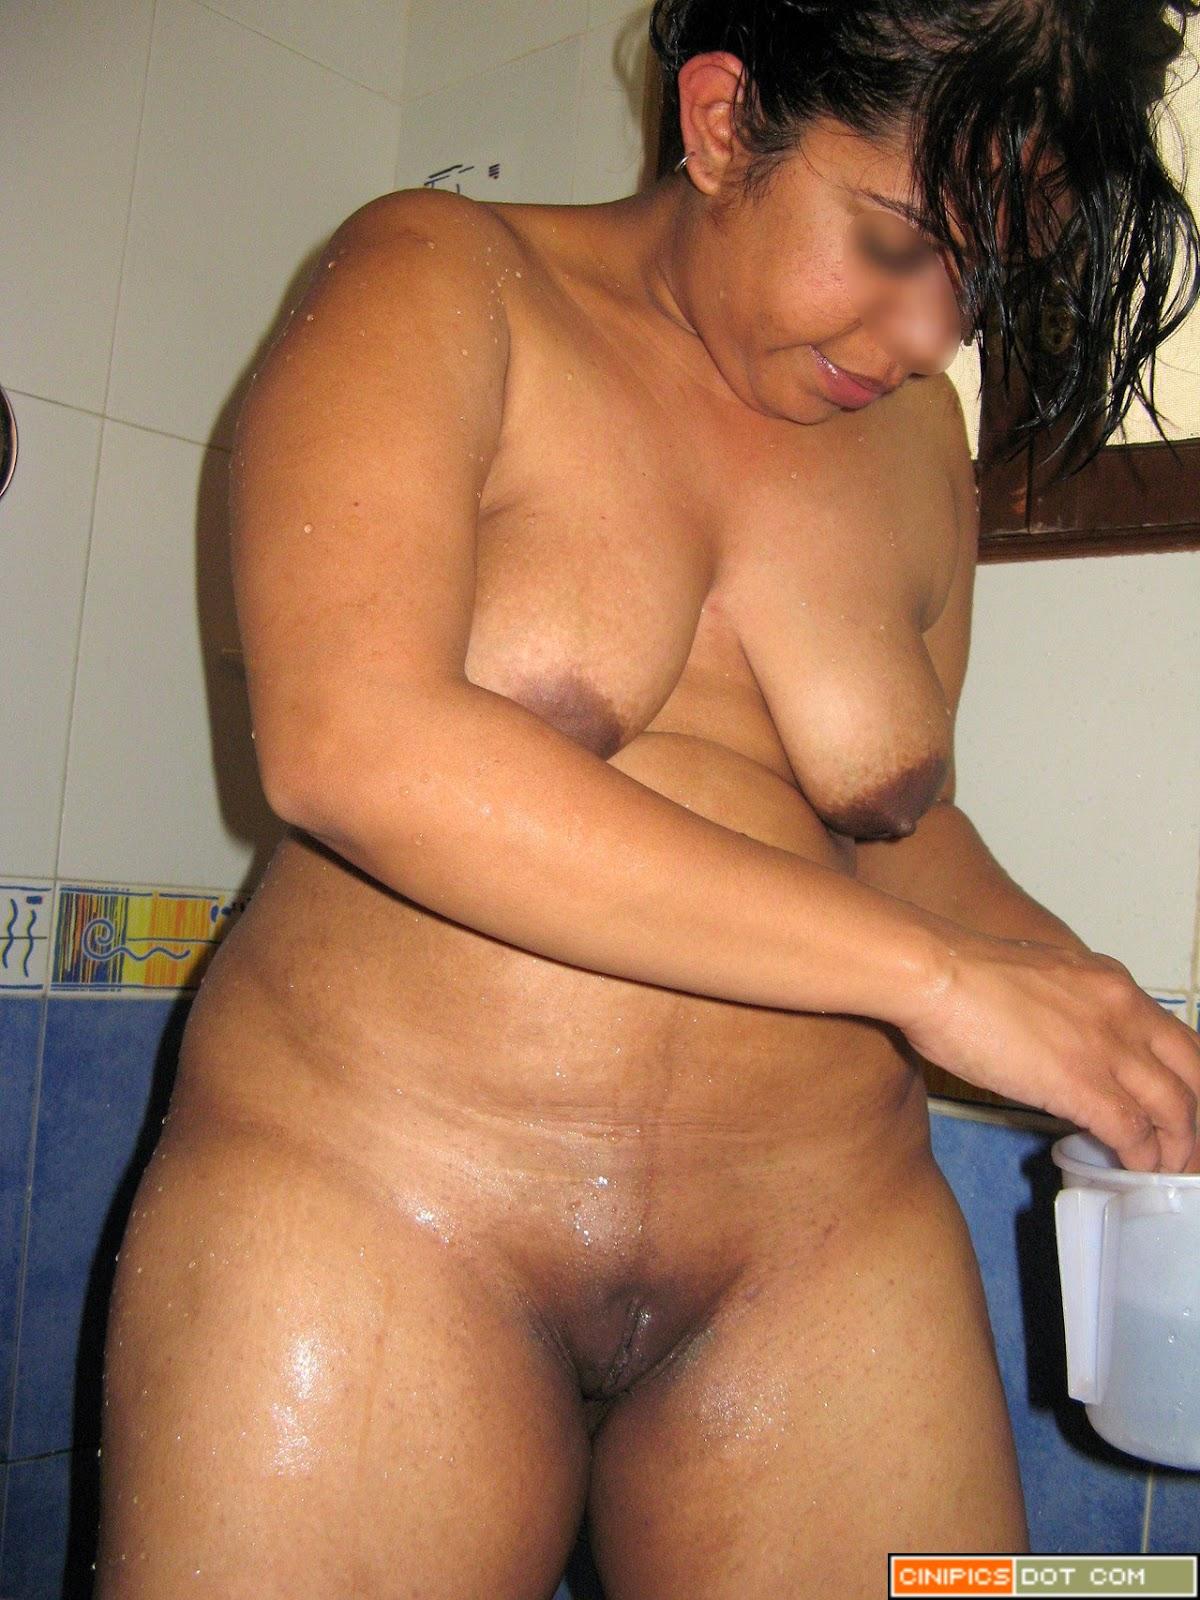 tamil nude auntys sexy mallu aunty bathing nude in resorts showing